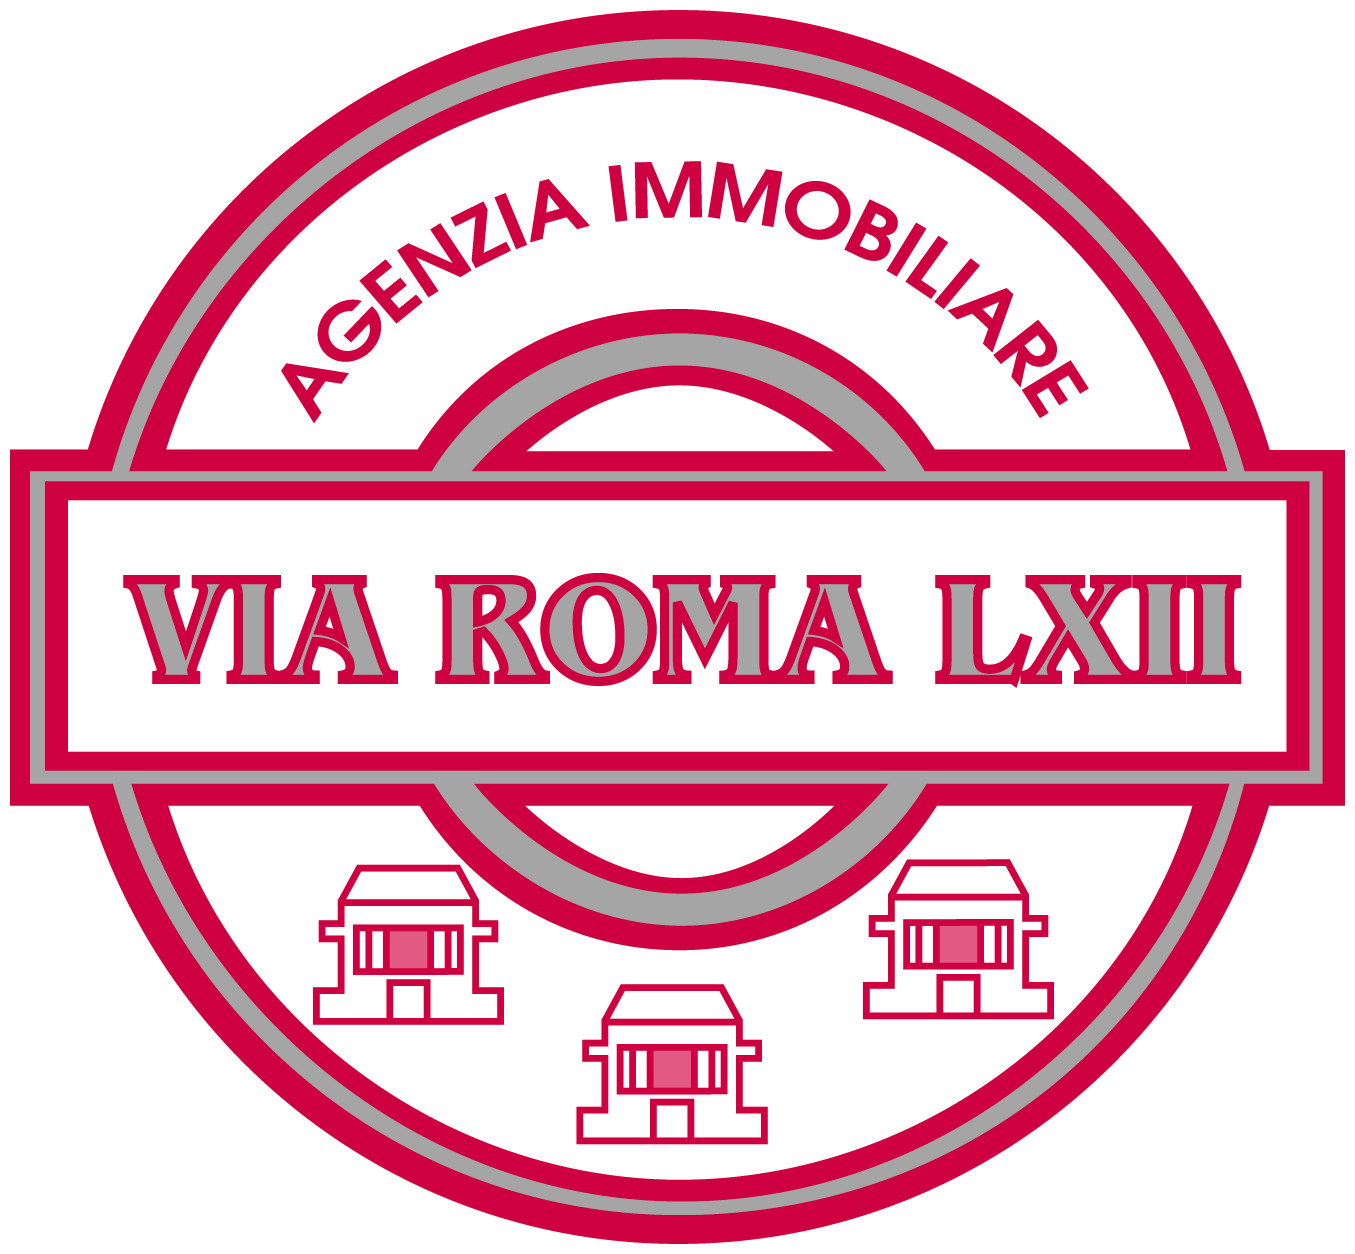 VIA ROMA LXII - Agenzia Imm.re